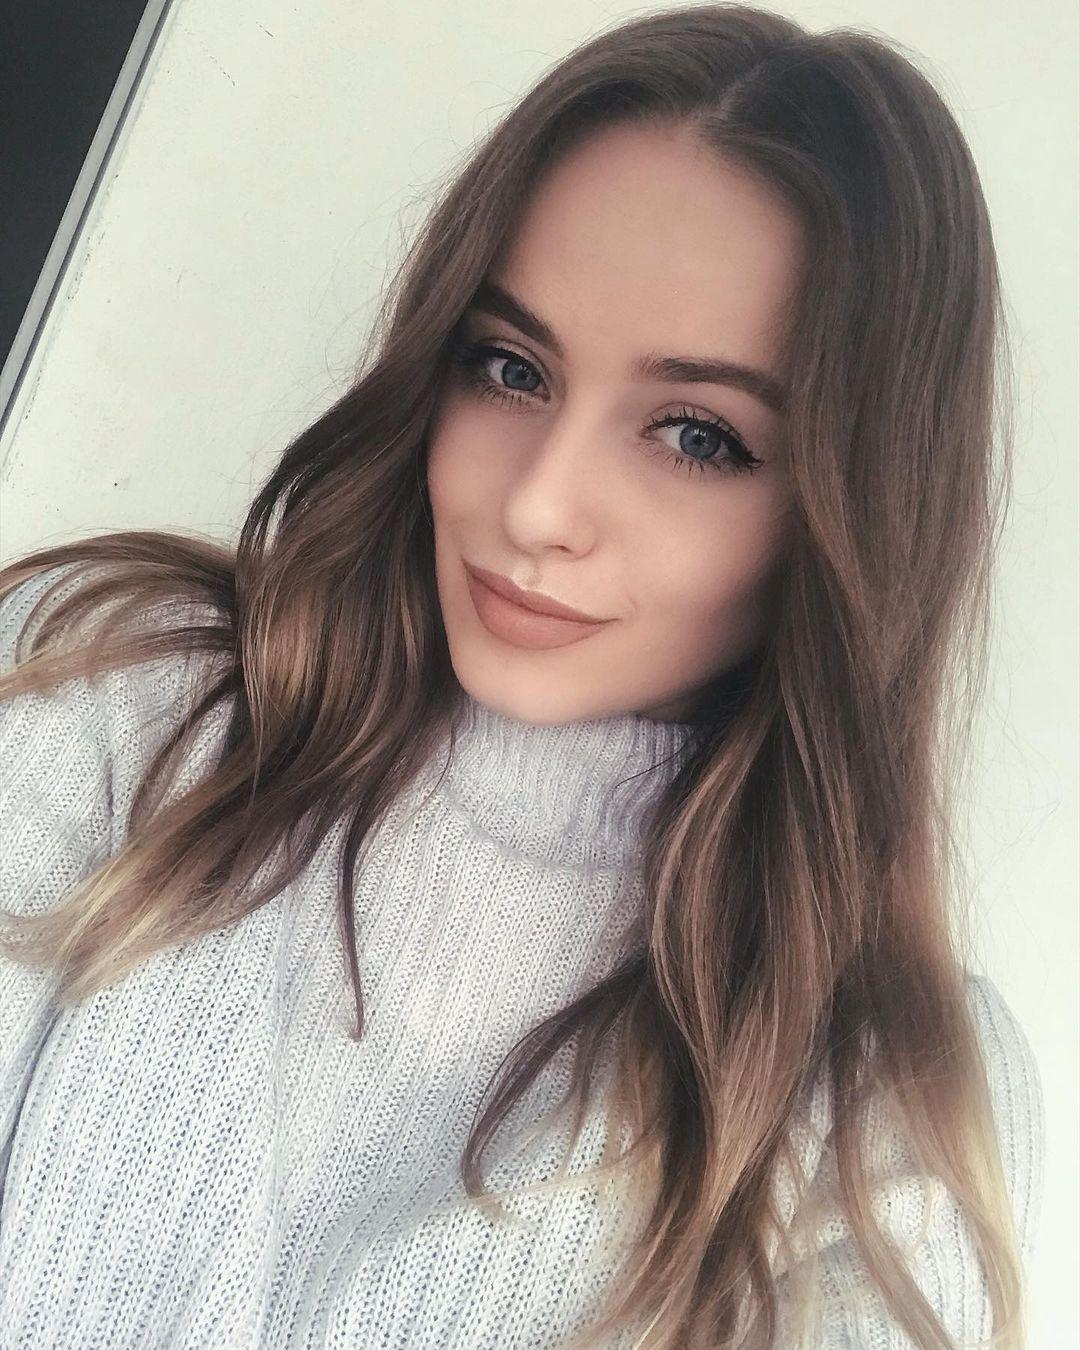 scandinavian girl with long hair